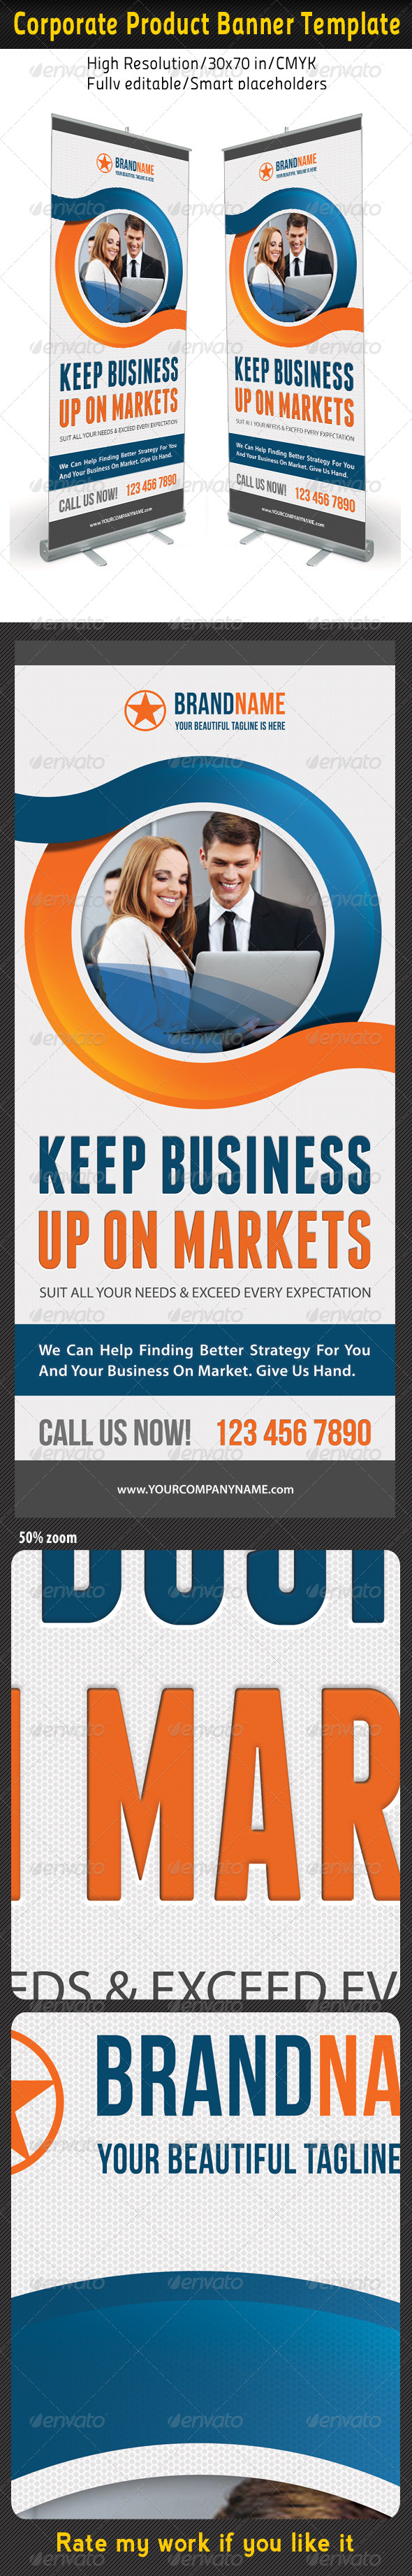 Corporate Multipurpose Banner Template 35 - Signage Print Templates